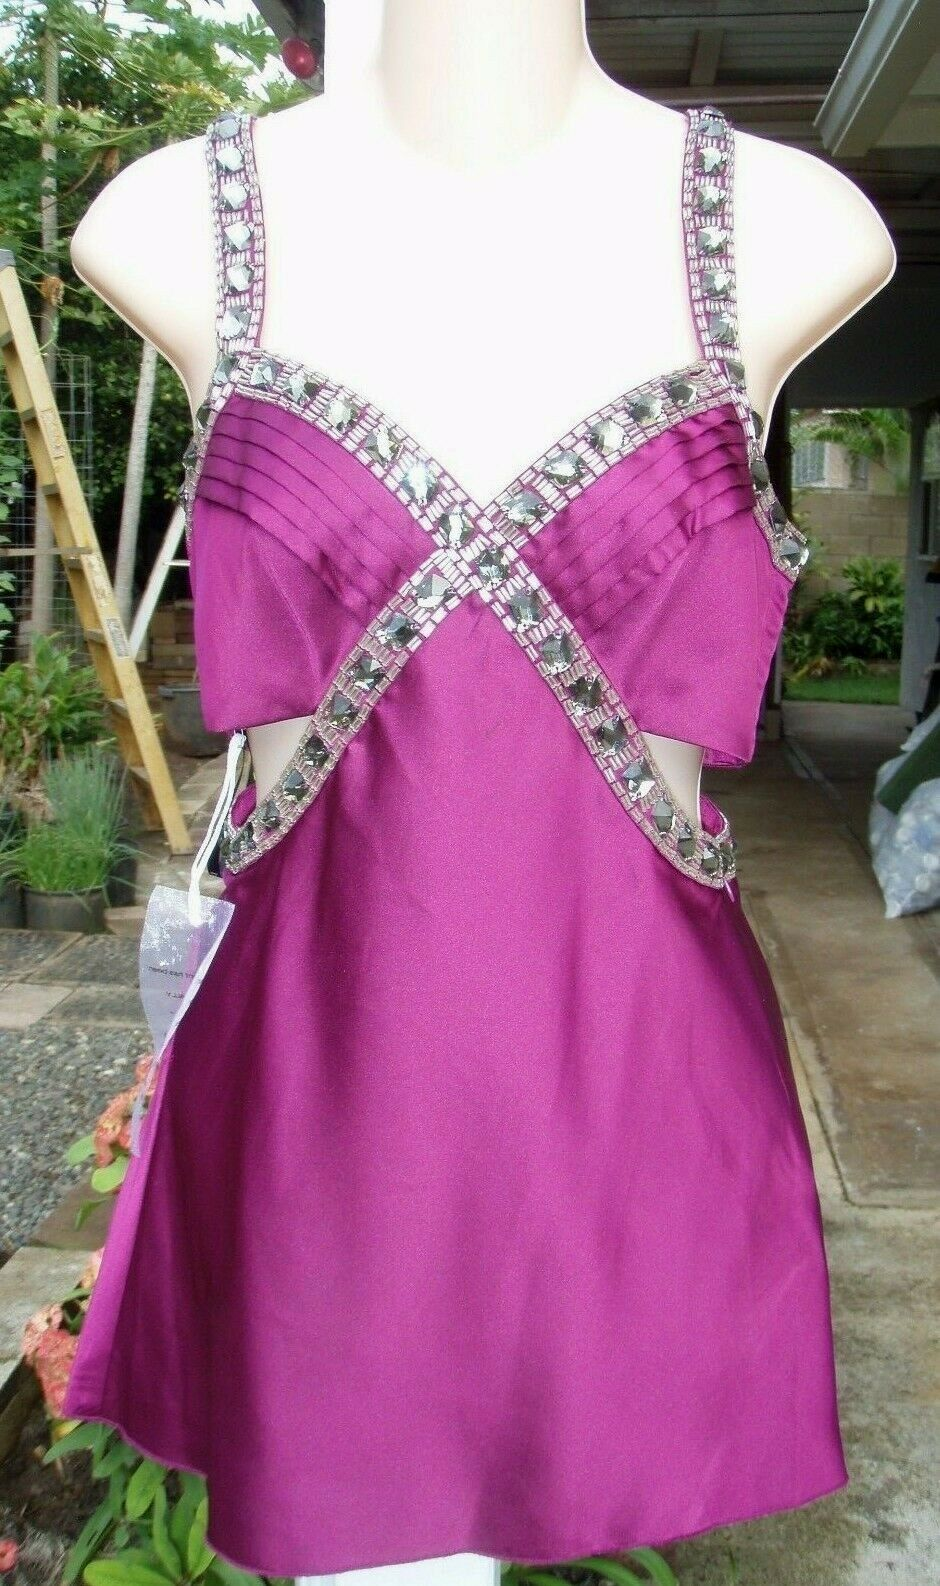 NWT BEBE Fuchsia Purple Jeweled Sexy Side Cutout Top XS NEW